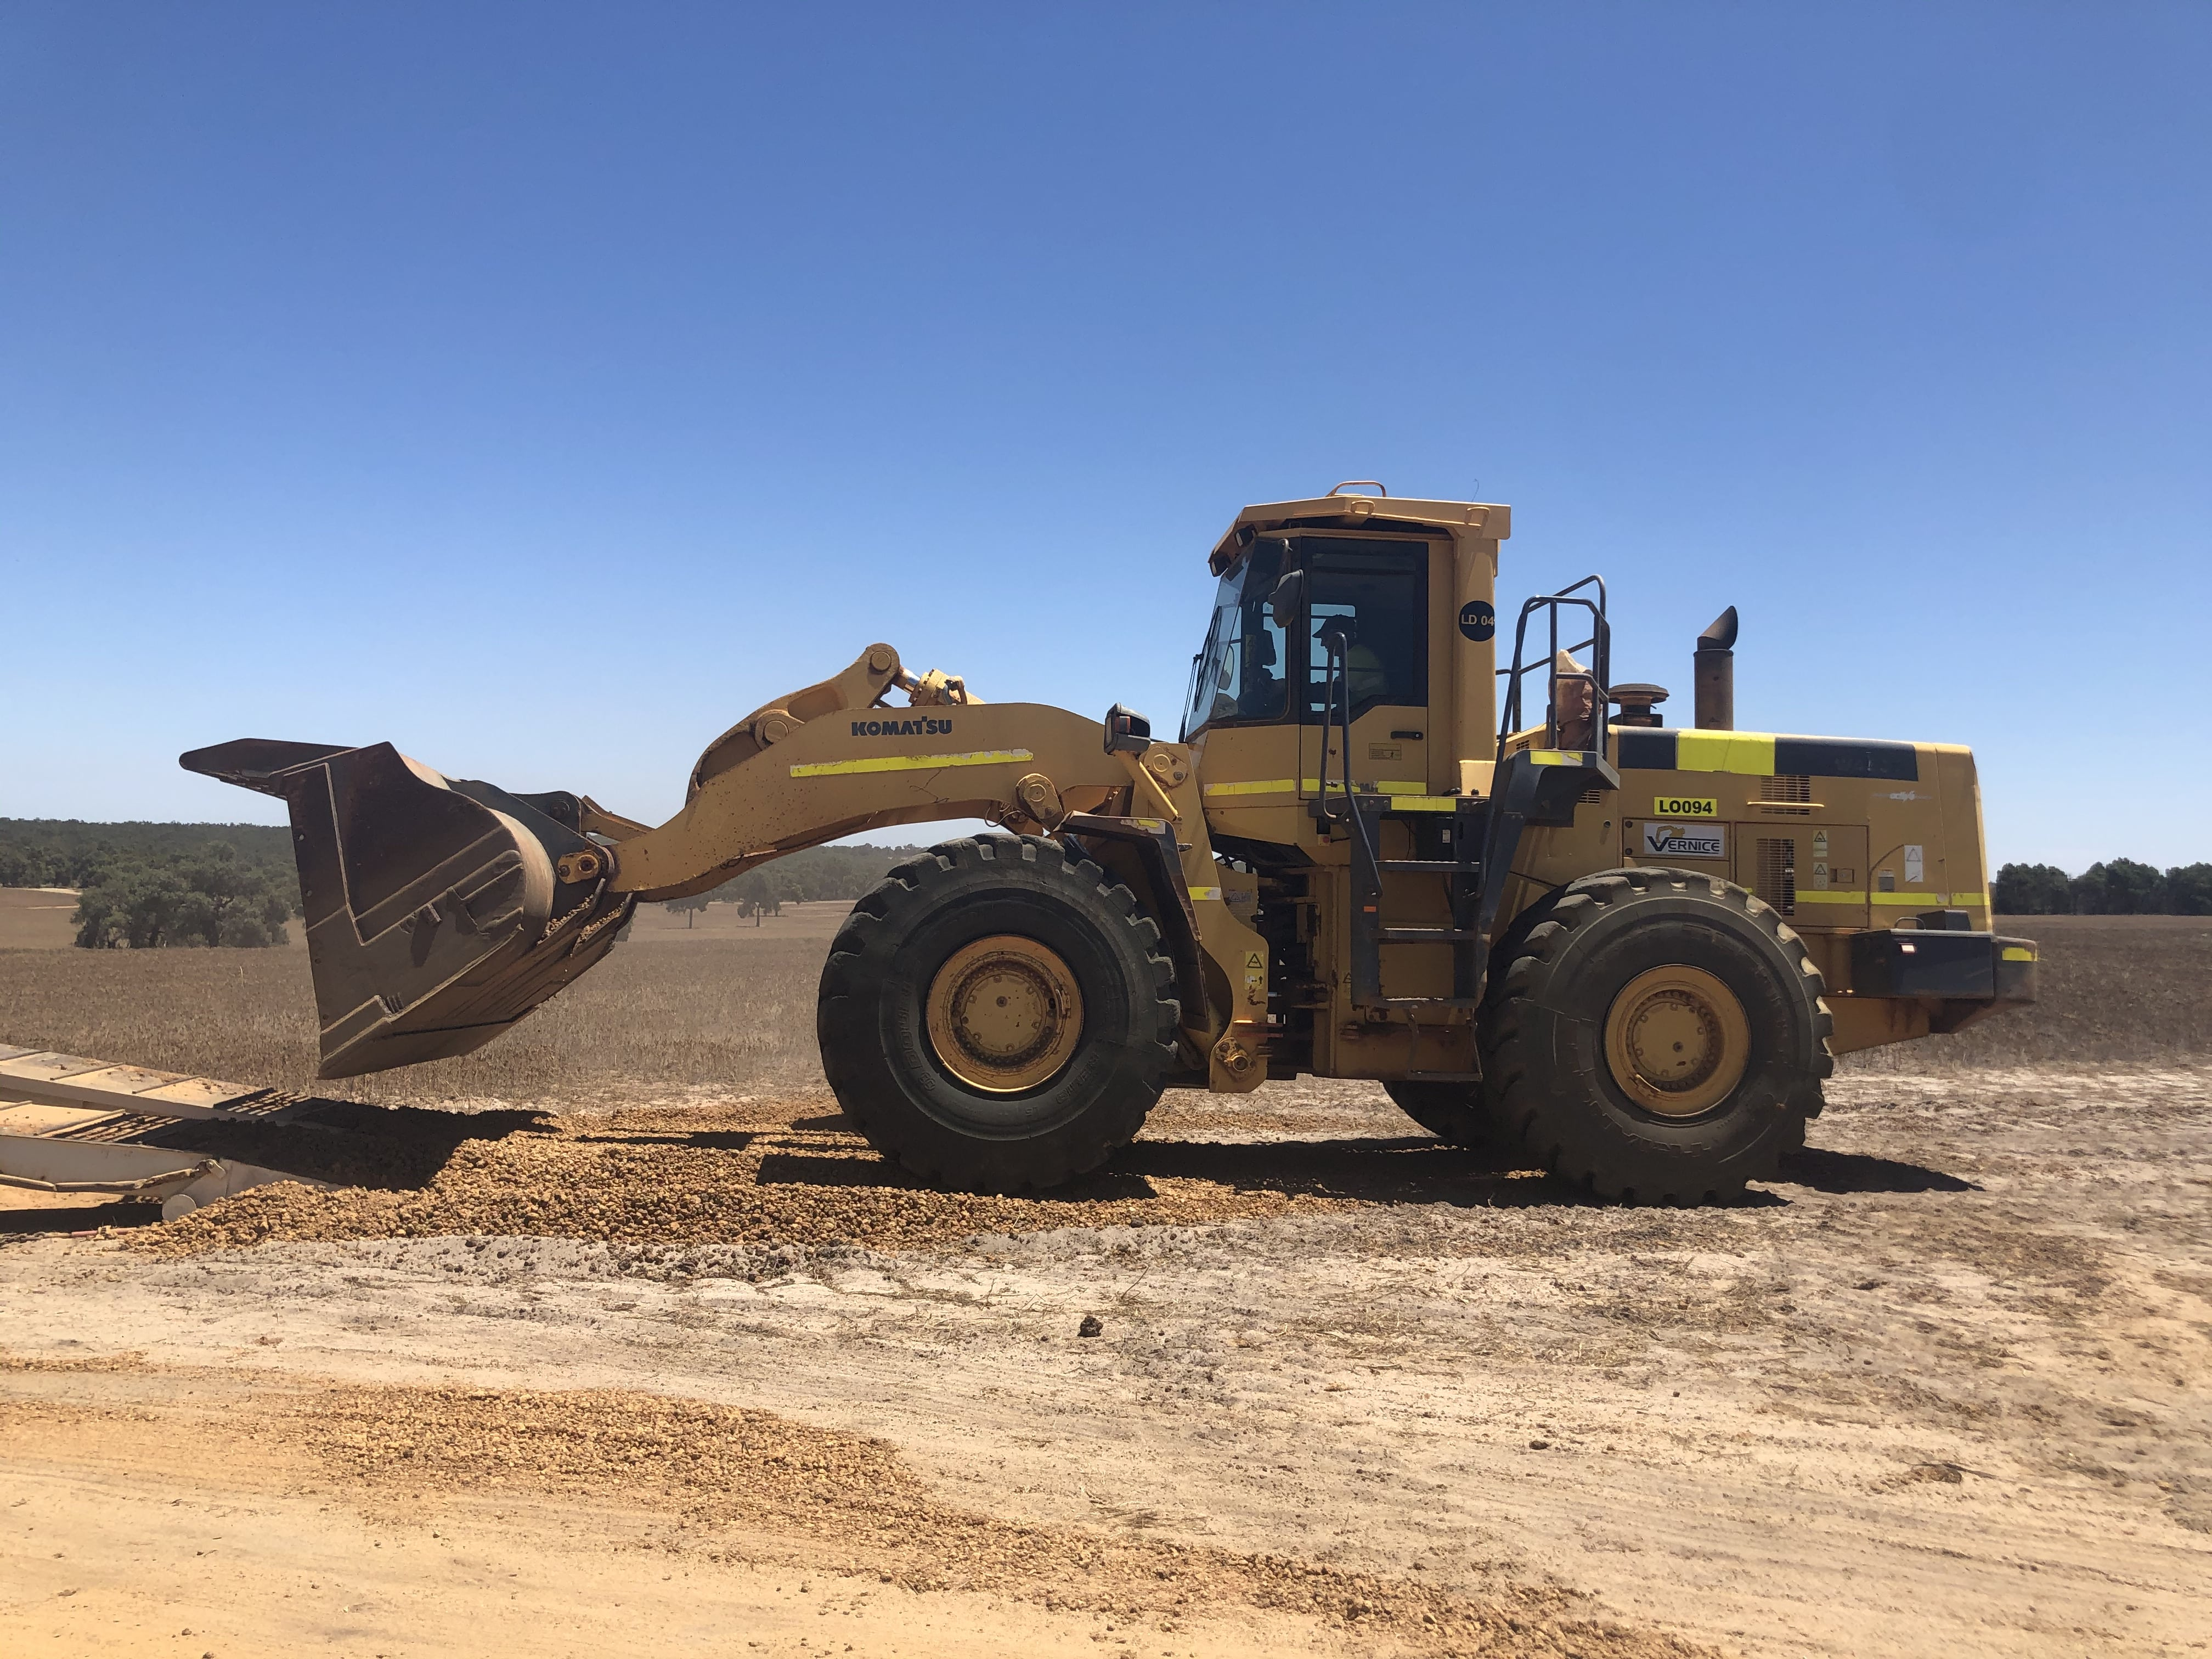 5t loader hire vernice western australia